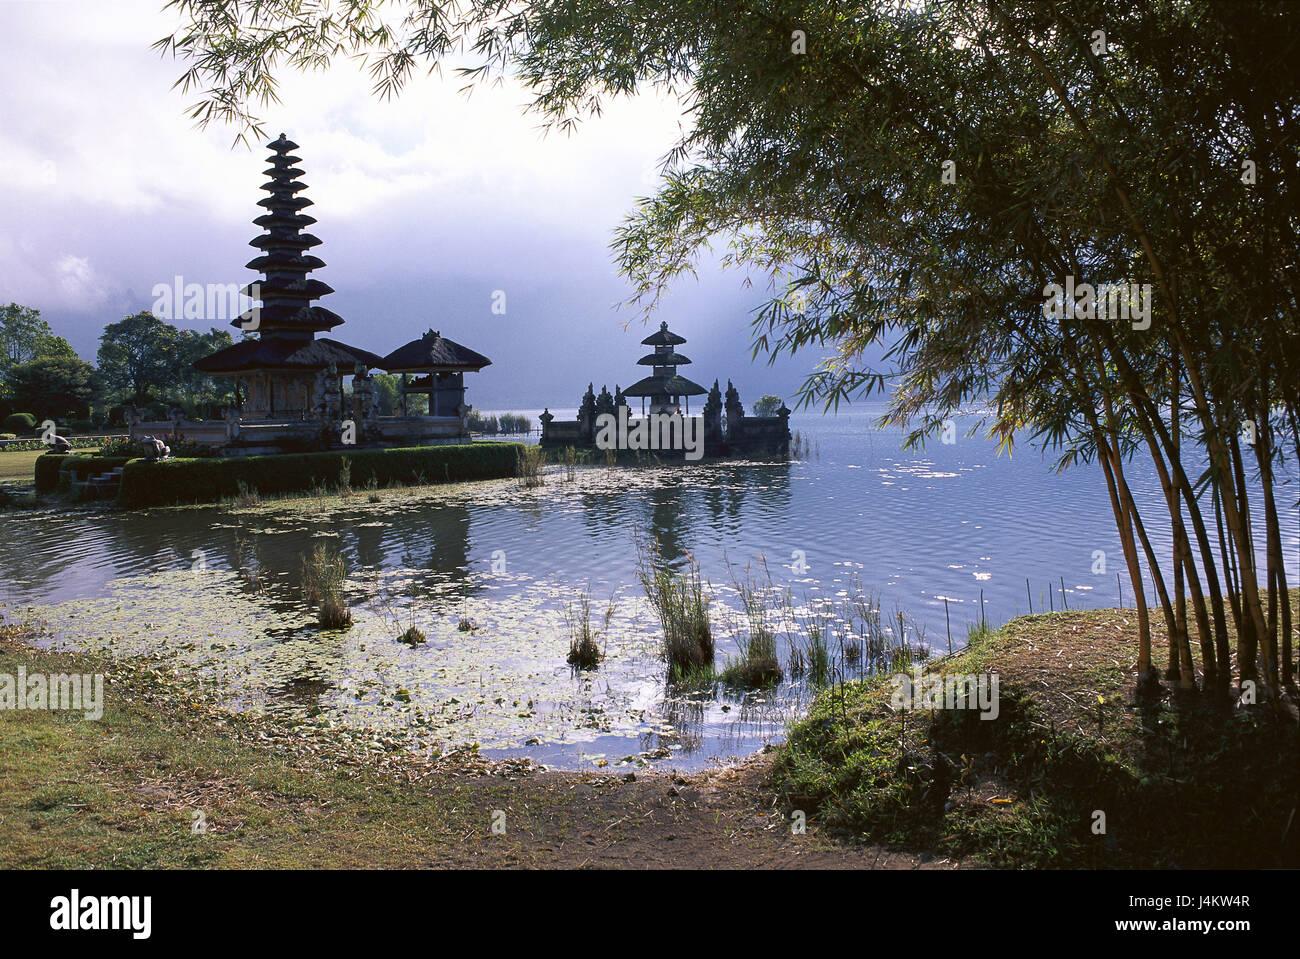 Indonesia, Bali, Bedugul, Danau Bratan lake, Pura Ulun Danu temple, back light Asia, South-East Asia, small Sundainseln, - Stock Image